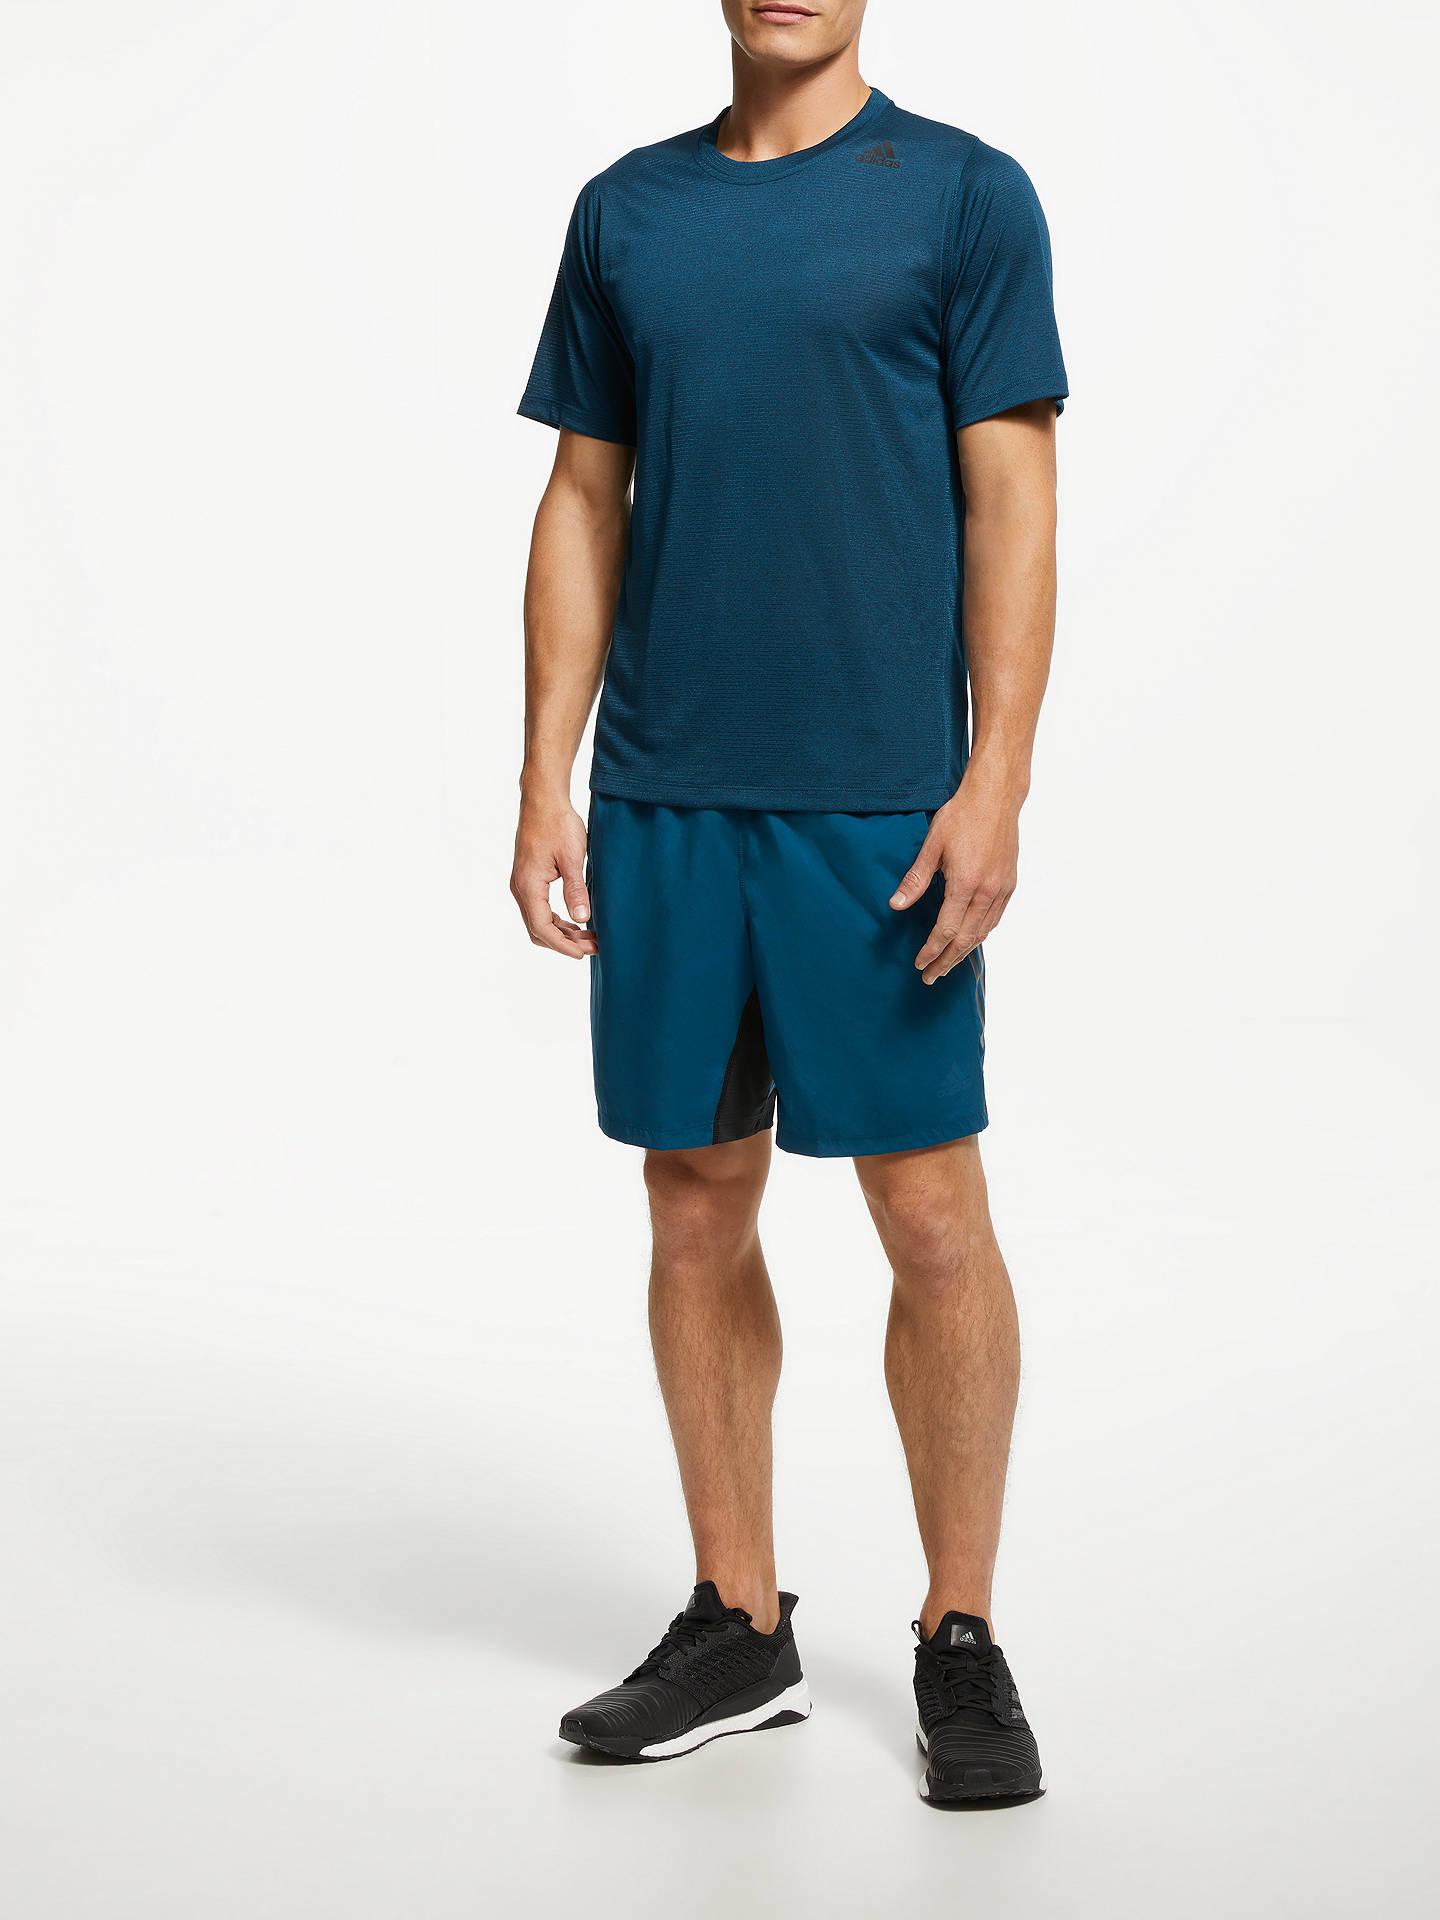 516f4b62d7 adidas 4KRFT Tech Woven 3-Stripes Training Shorts, Legend Marine at ...